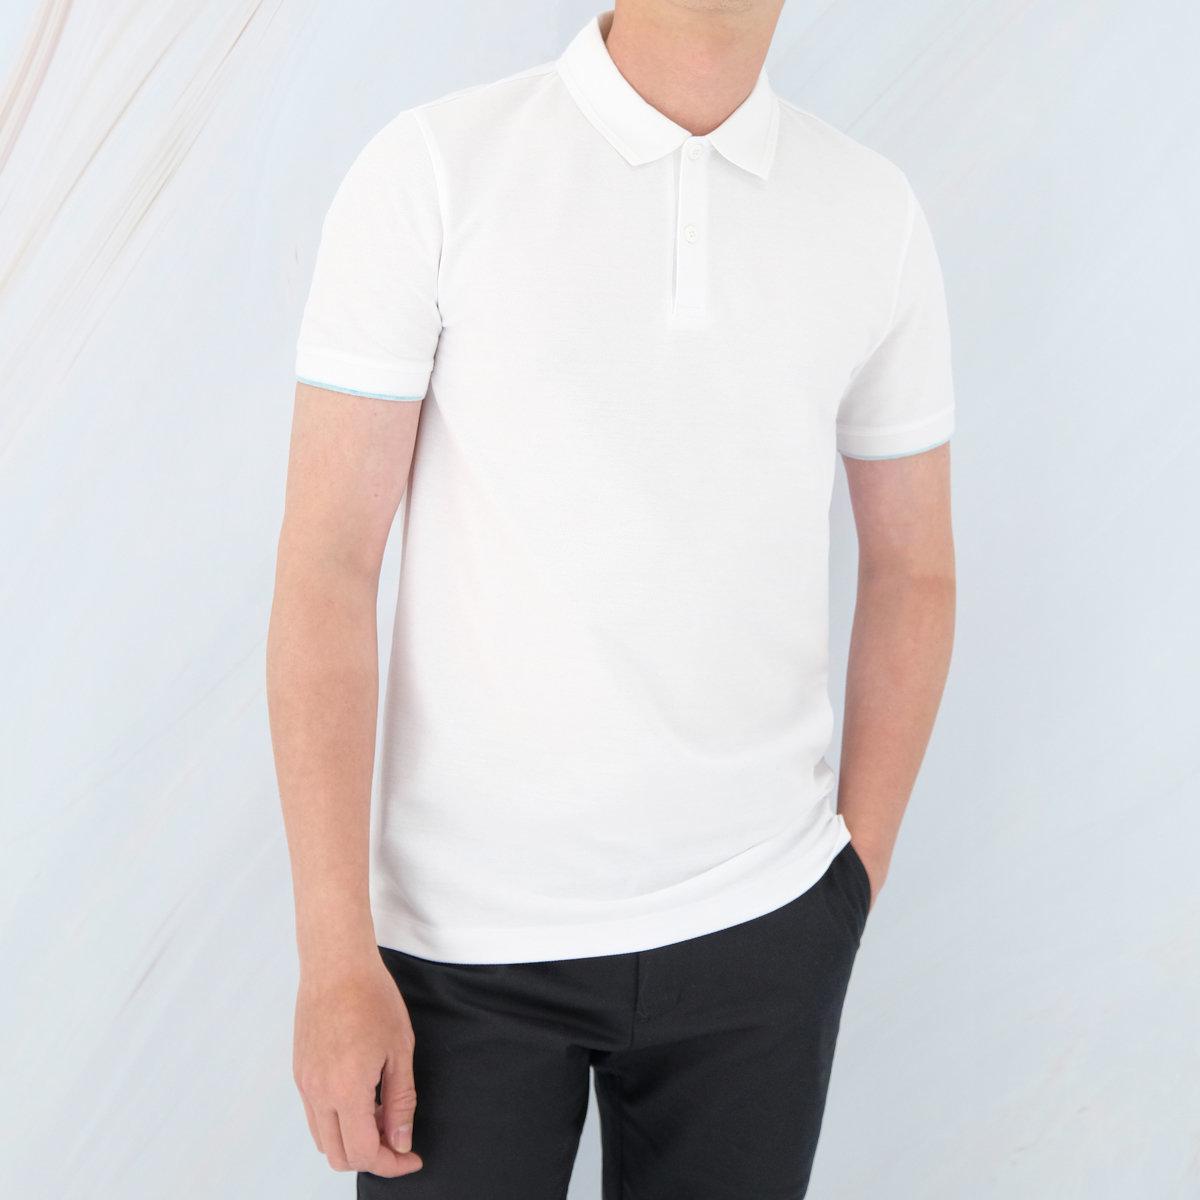 Men's Cotton Polyester Blended Polo (White)